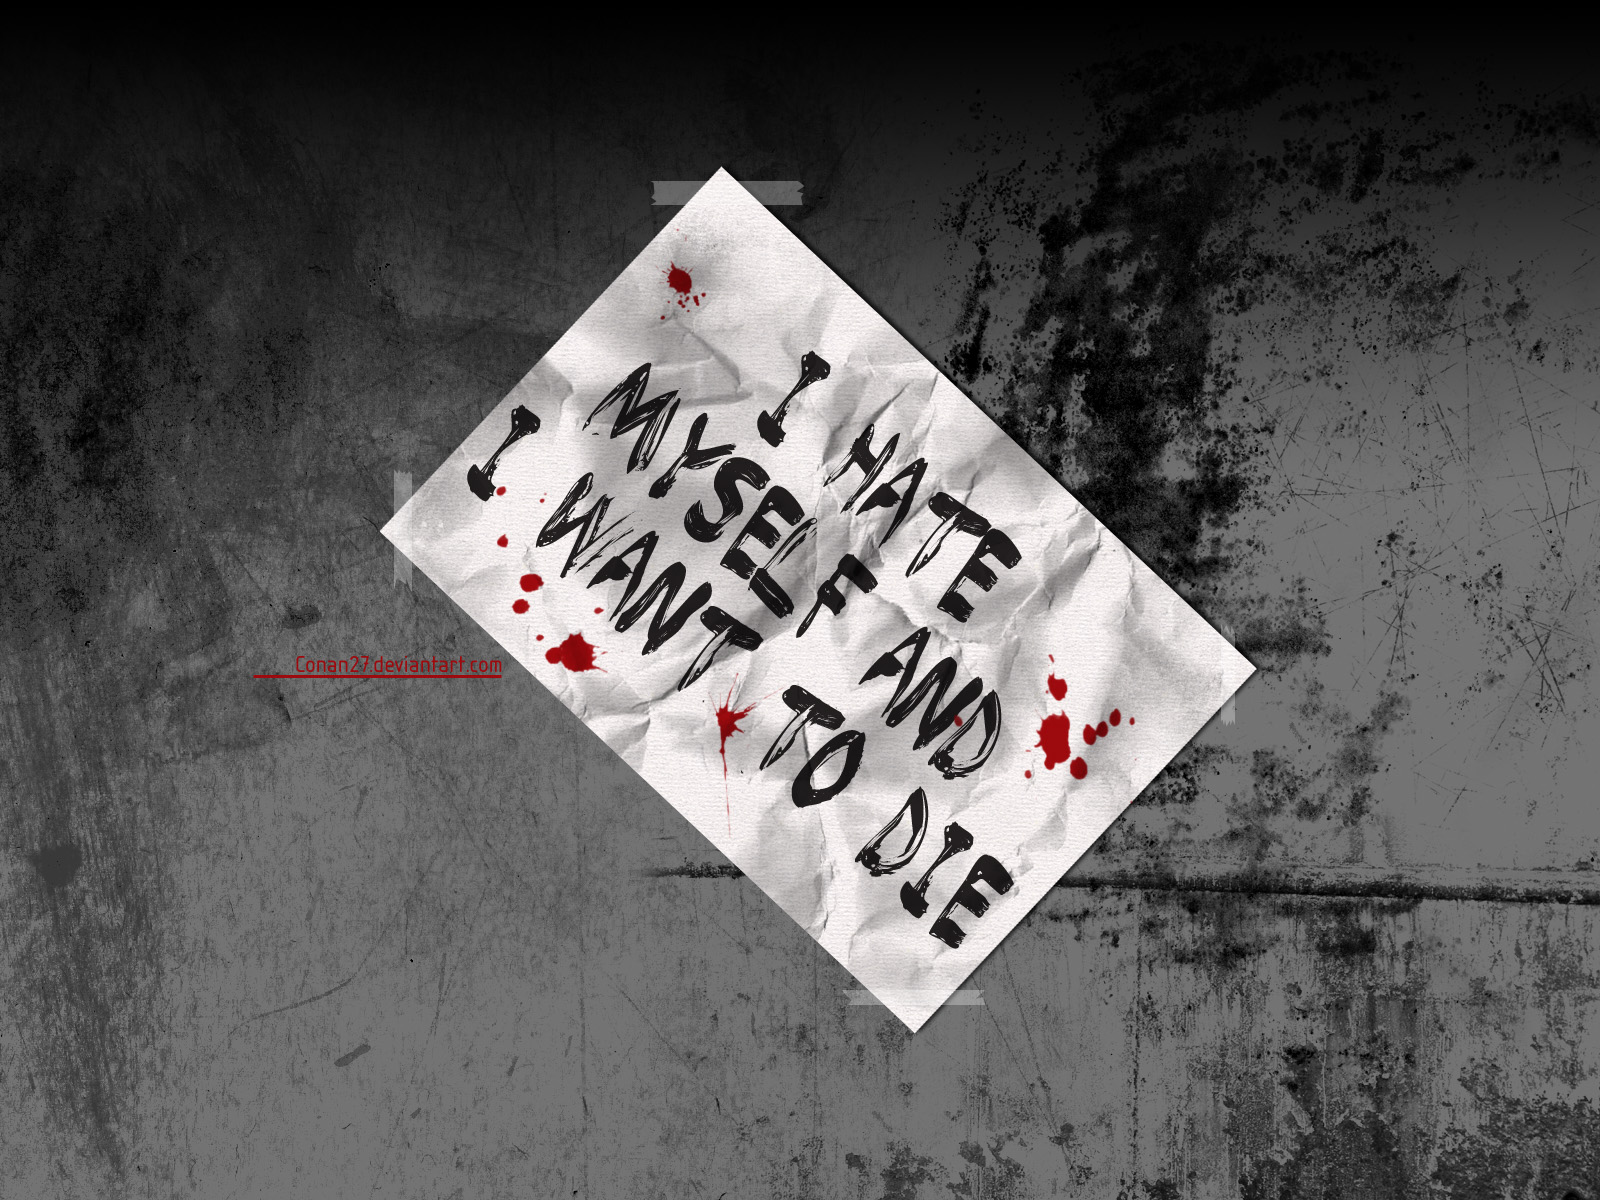 http://2.bp.blogspot.com/-qQW5qeppBE4/TdpSd4c4_sI/AAAAAAAADvo/0okSn9RRFrM/s1600/I_Hate_Myself_And_Want_To_Die_by_Conan27.jpg